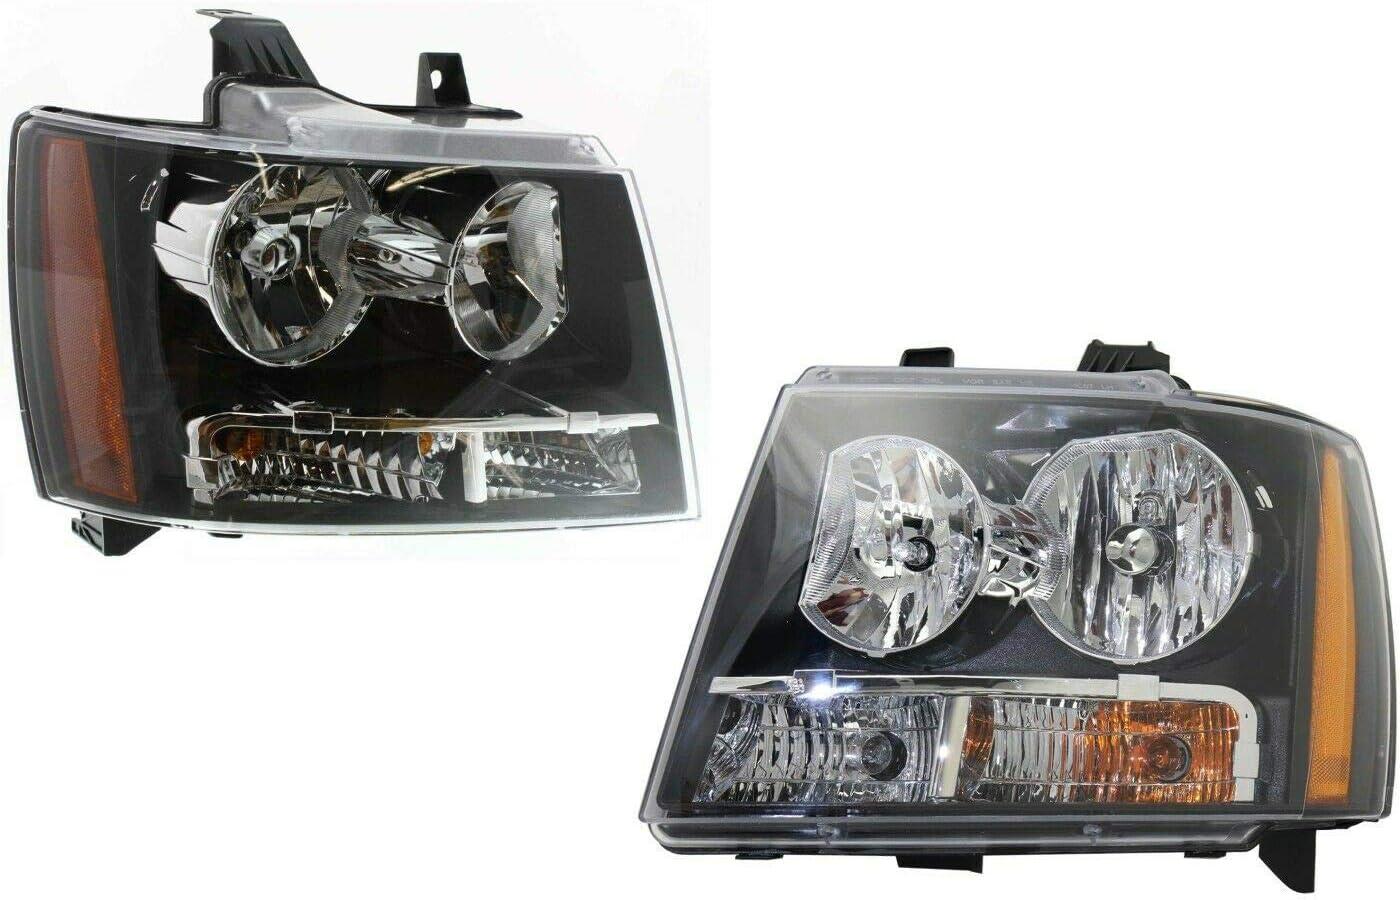 Puermto Headlight Set Compatible with Cab Pickup Left Alternative dealer Rig Crew Regular store